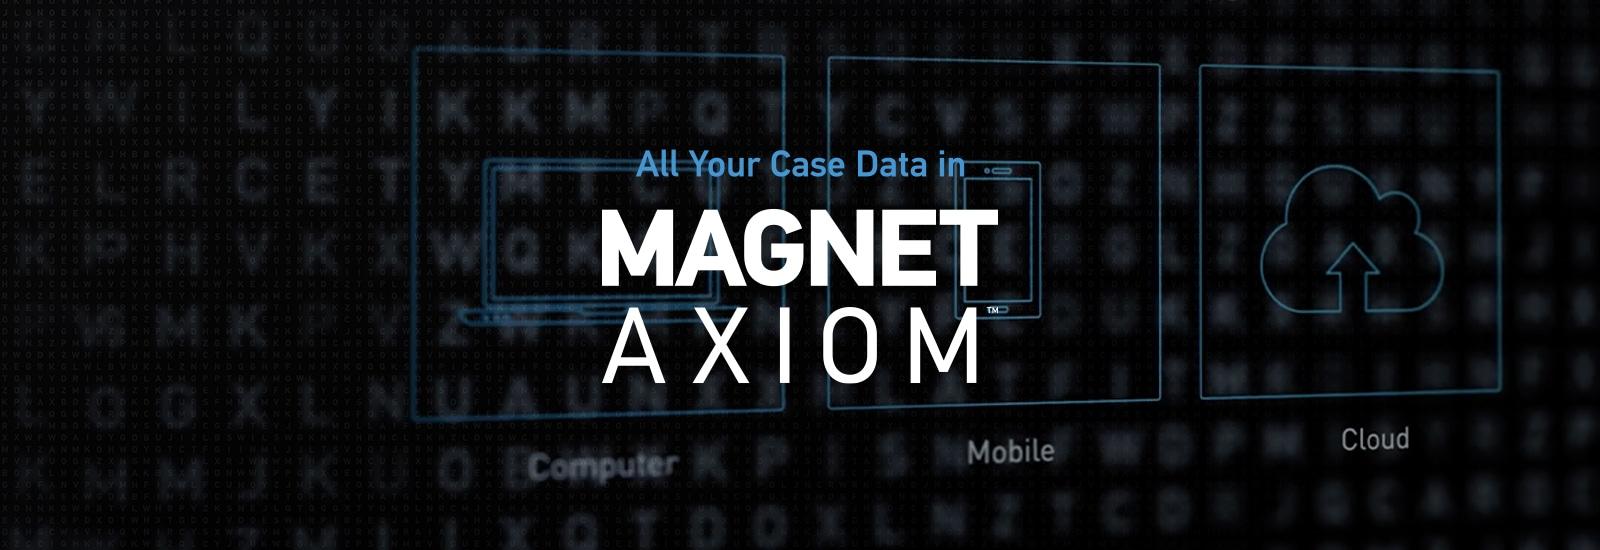 Magnet AXIOM Pt. 1